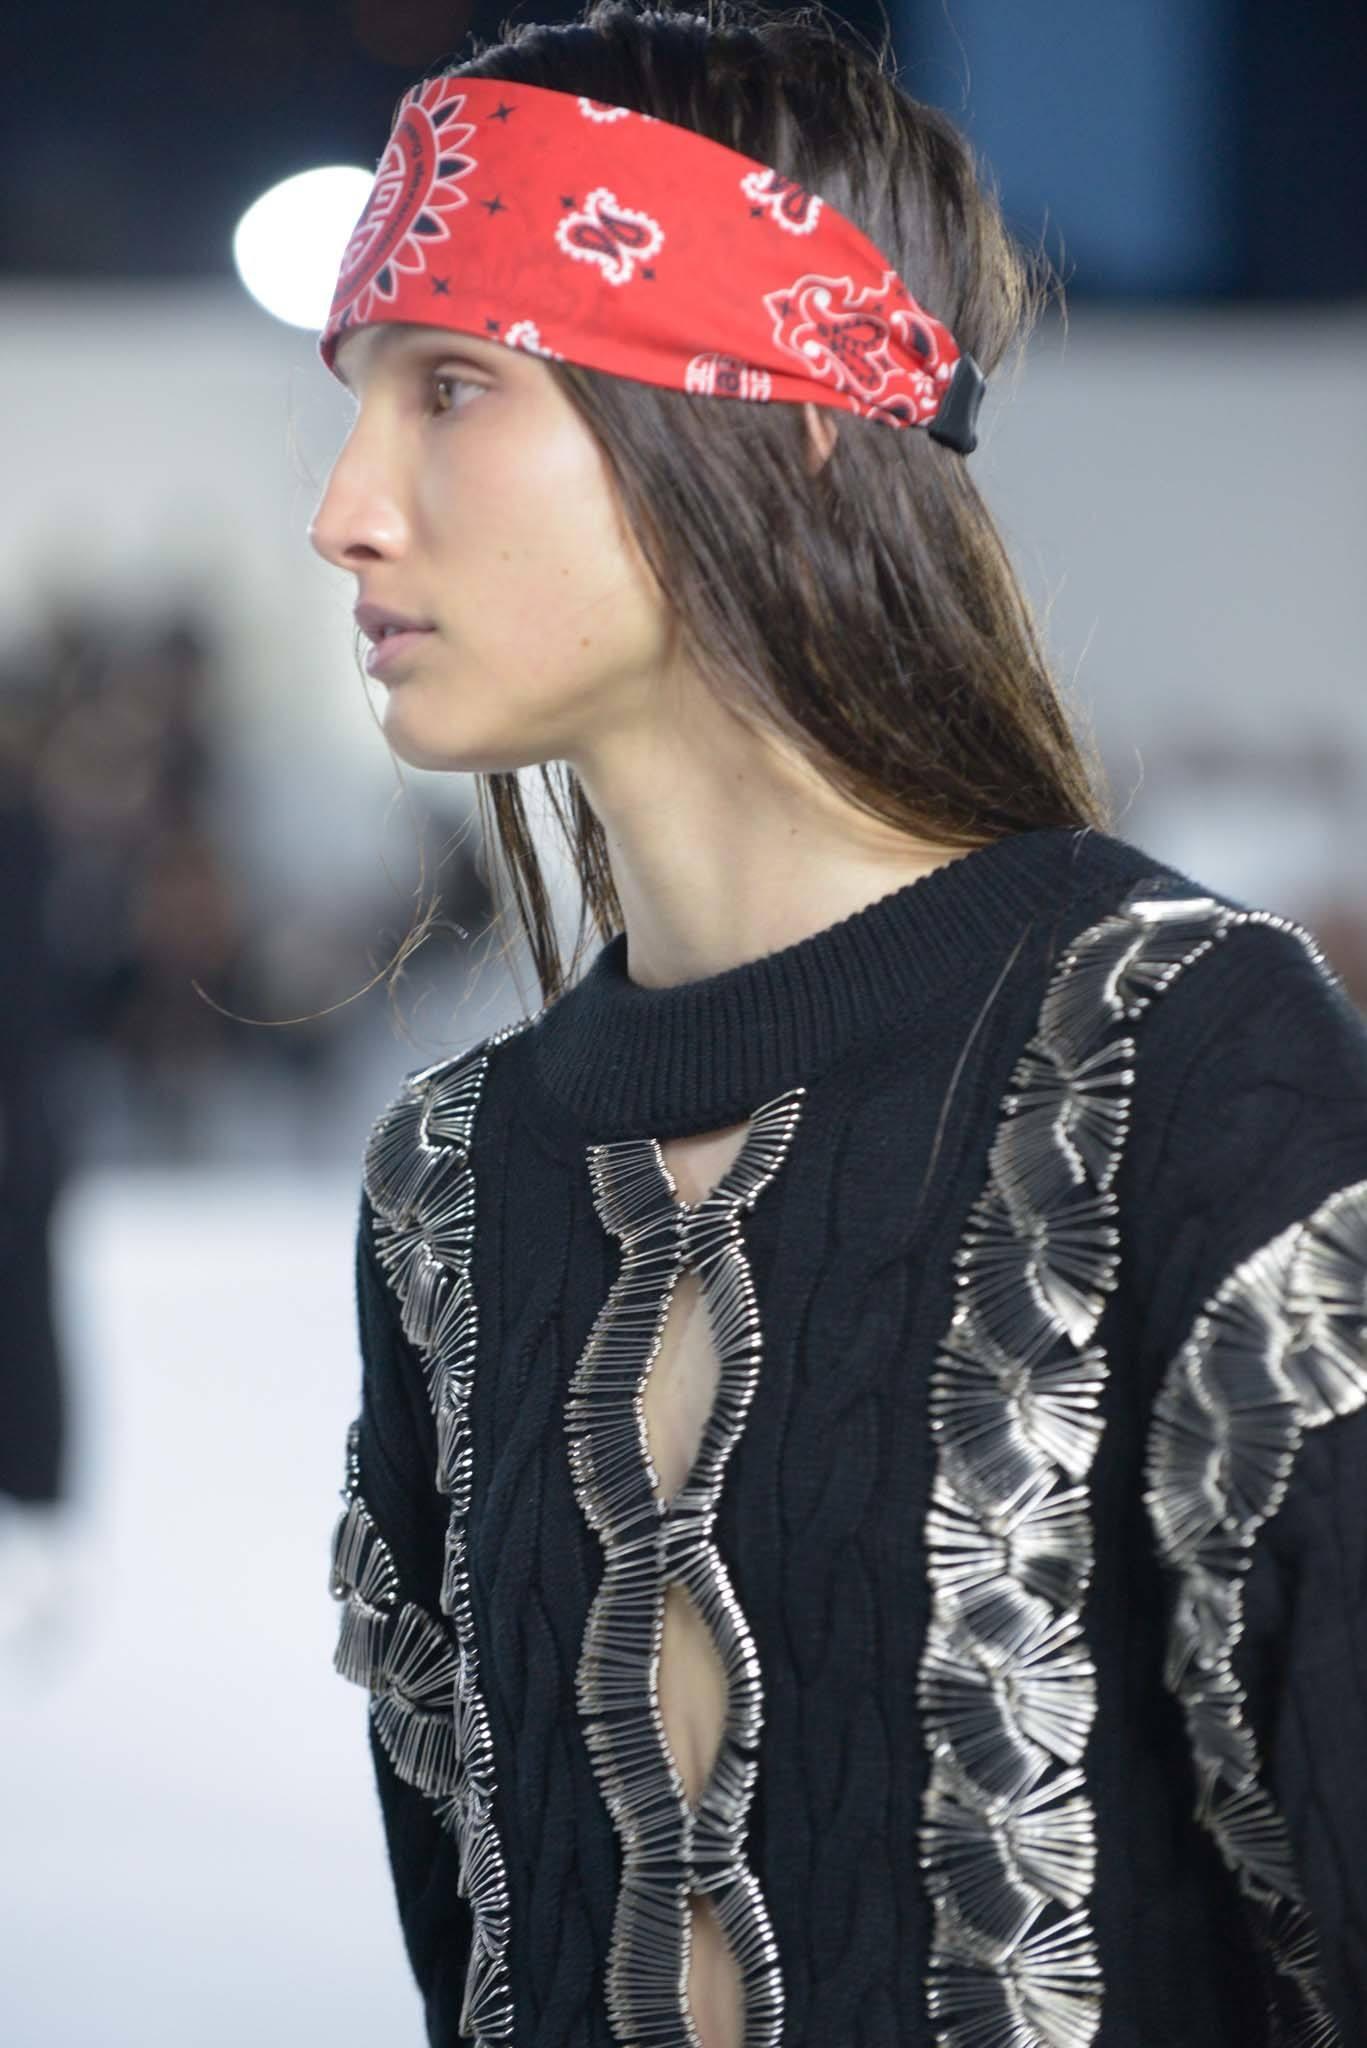 big game hairstyles: bandana